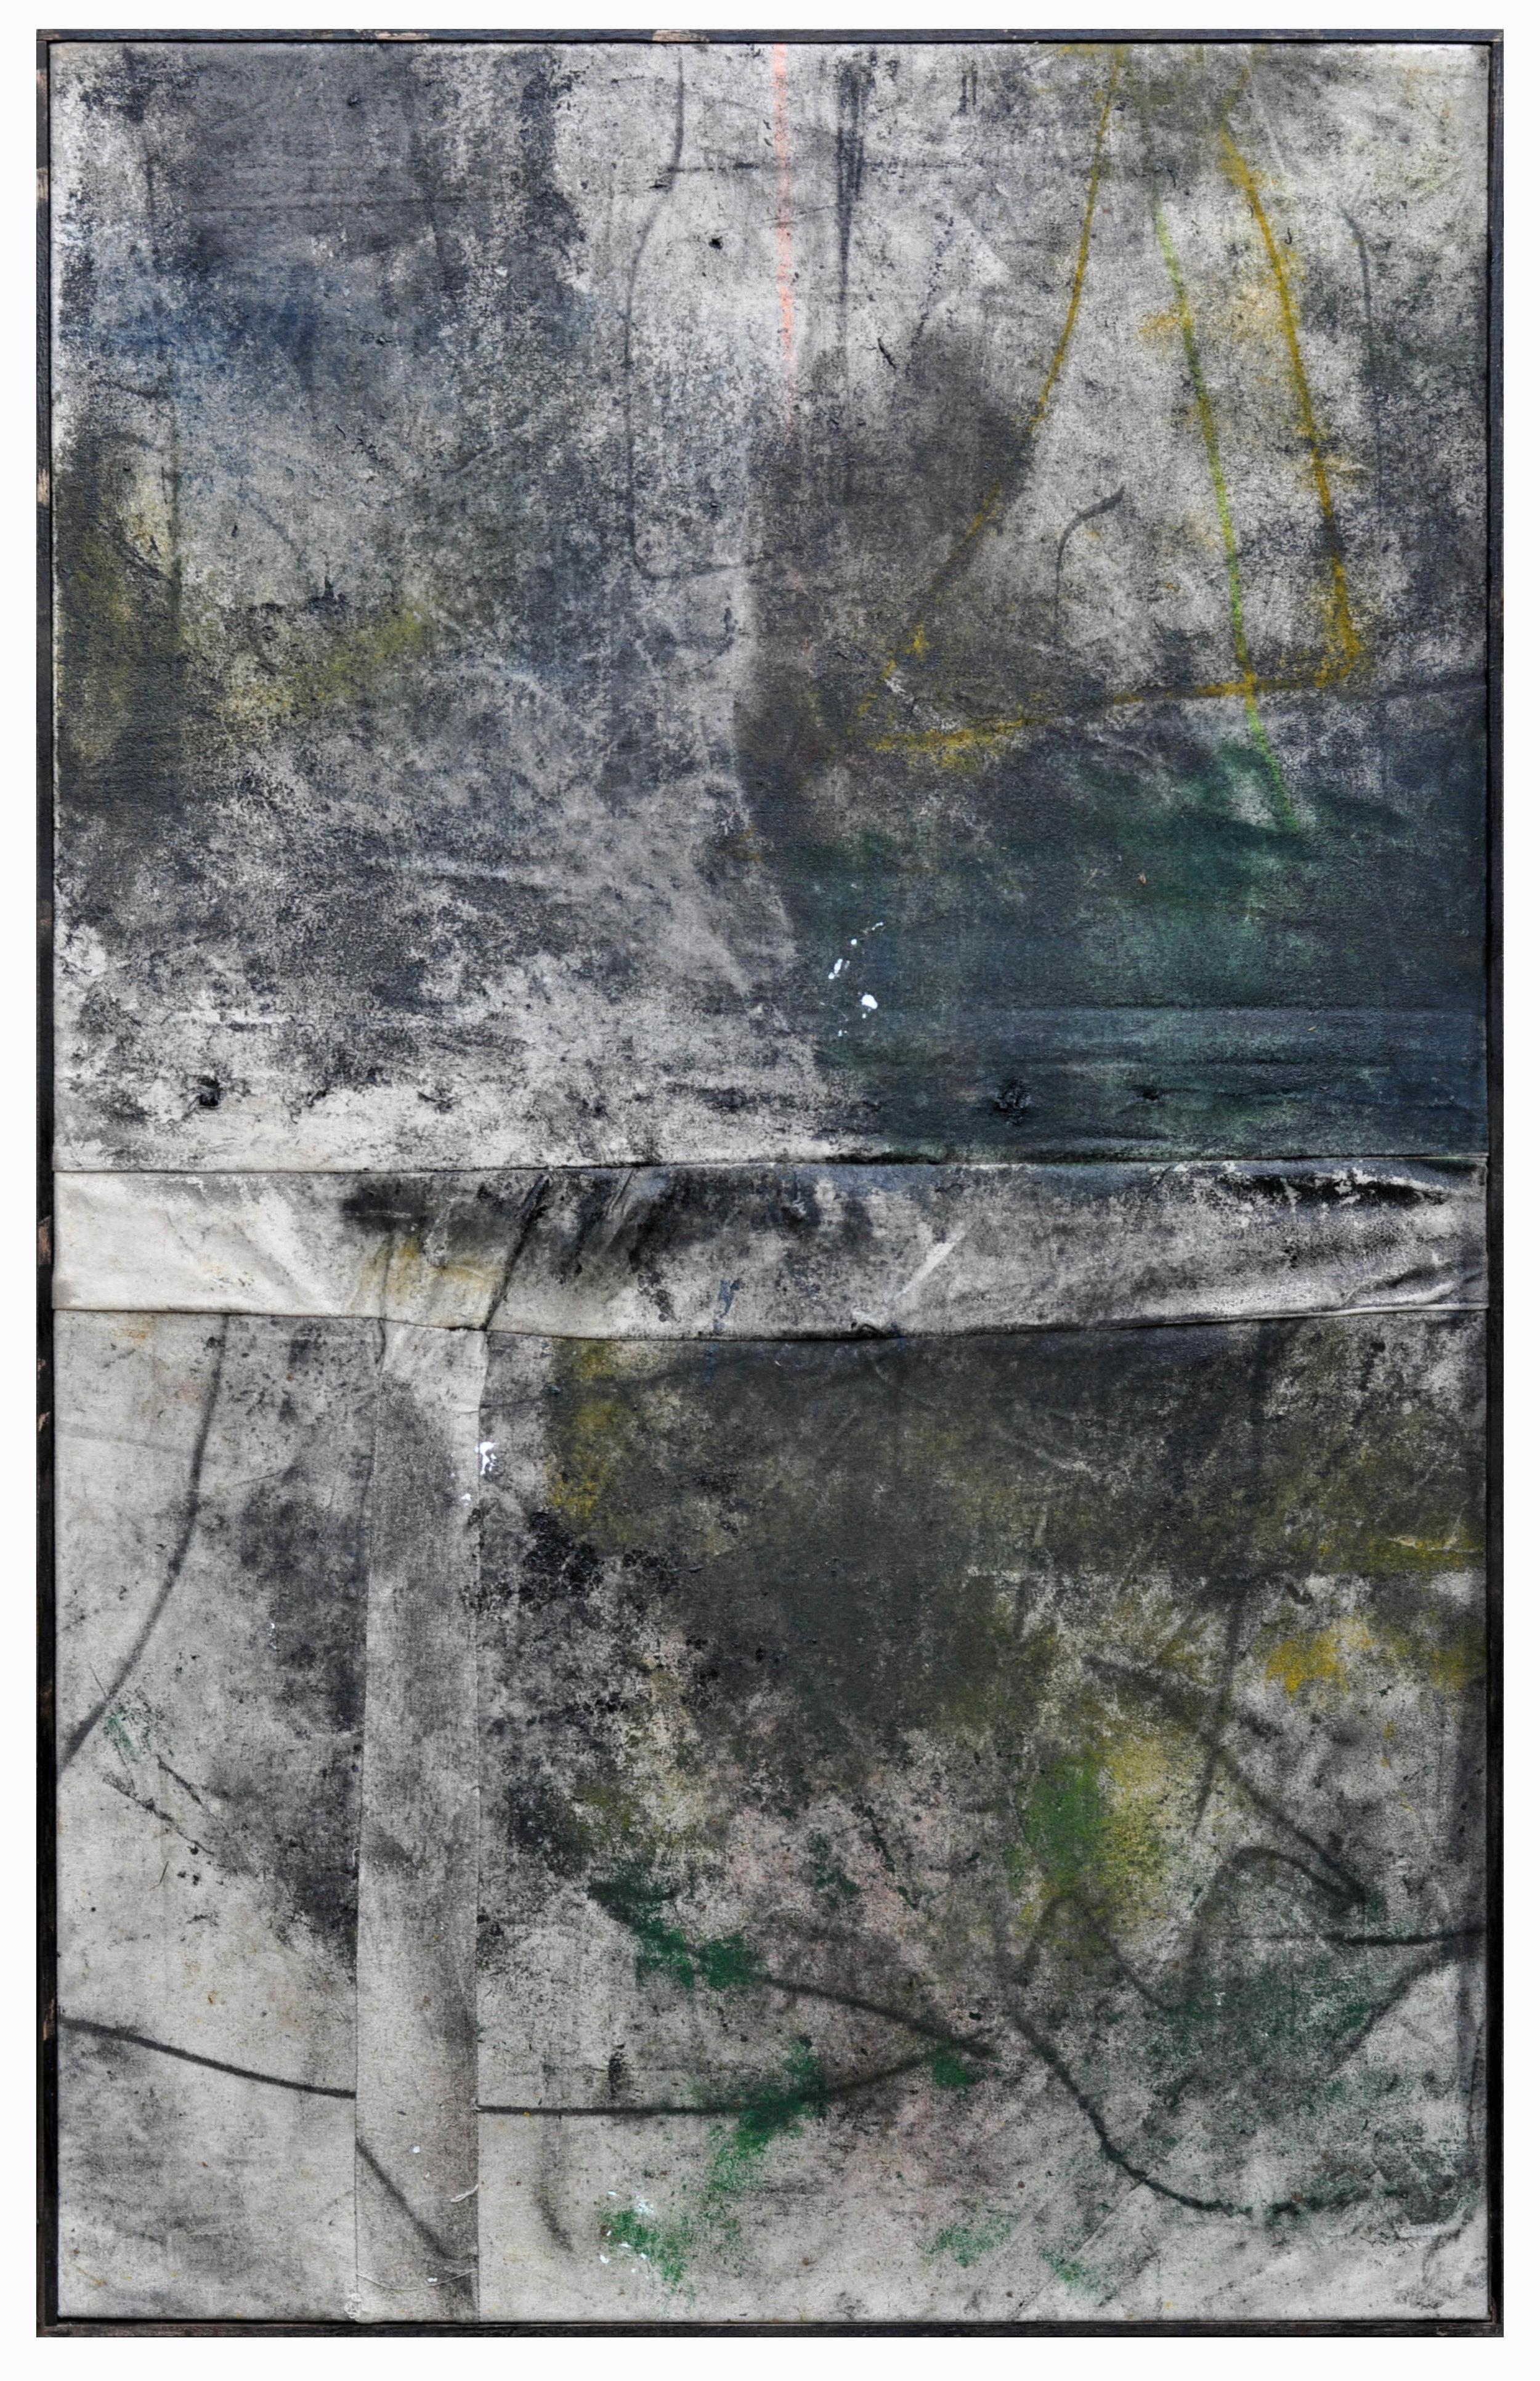 Ryan McGennisken, Pasta 78 x 124 cm, spray paint, thred, on canvas, oak frame, available